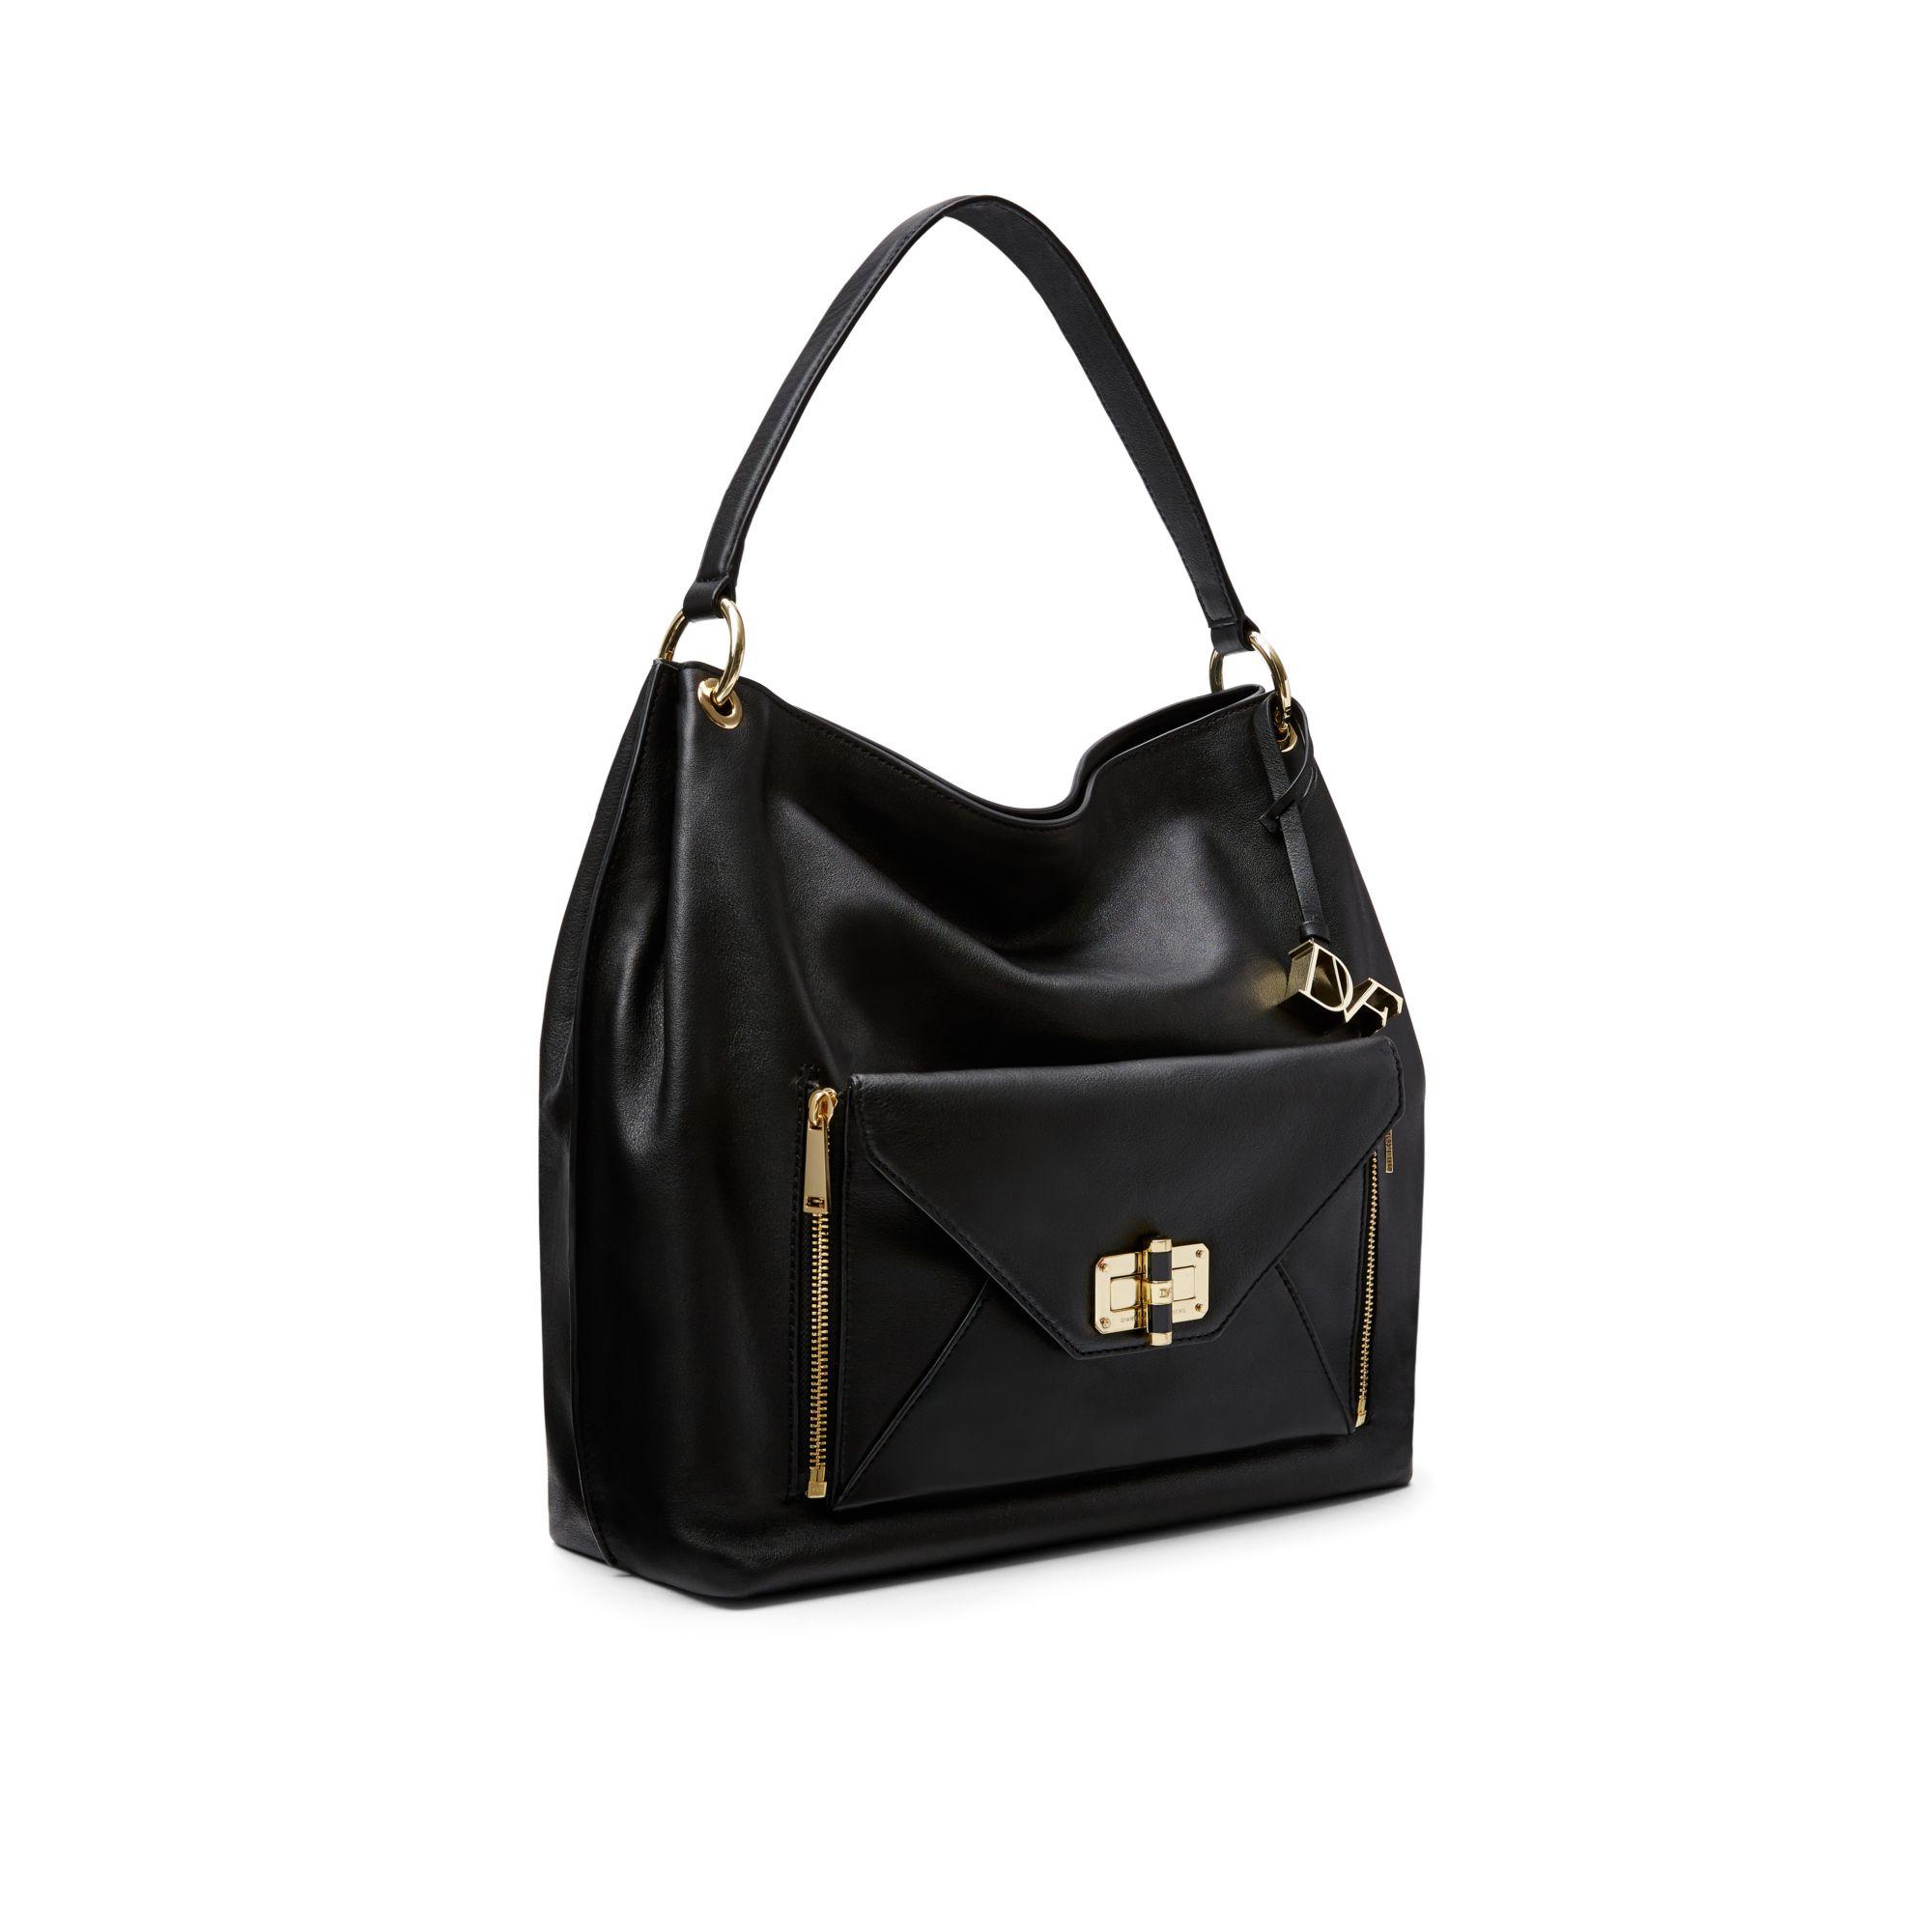 42ab7e8f4c Gallery. Lyst Diane Von Furstenberg Secret Agent Leather Hobo Bag In Black